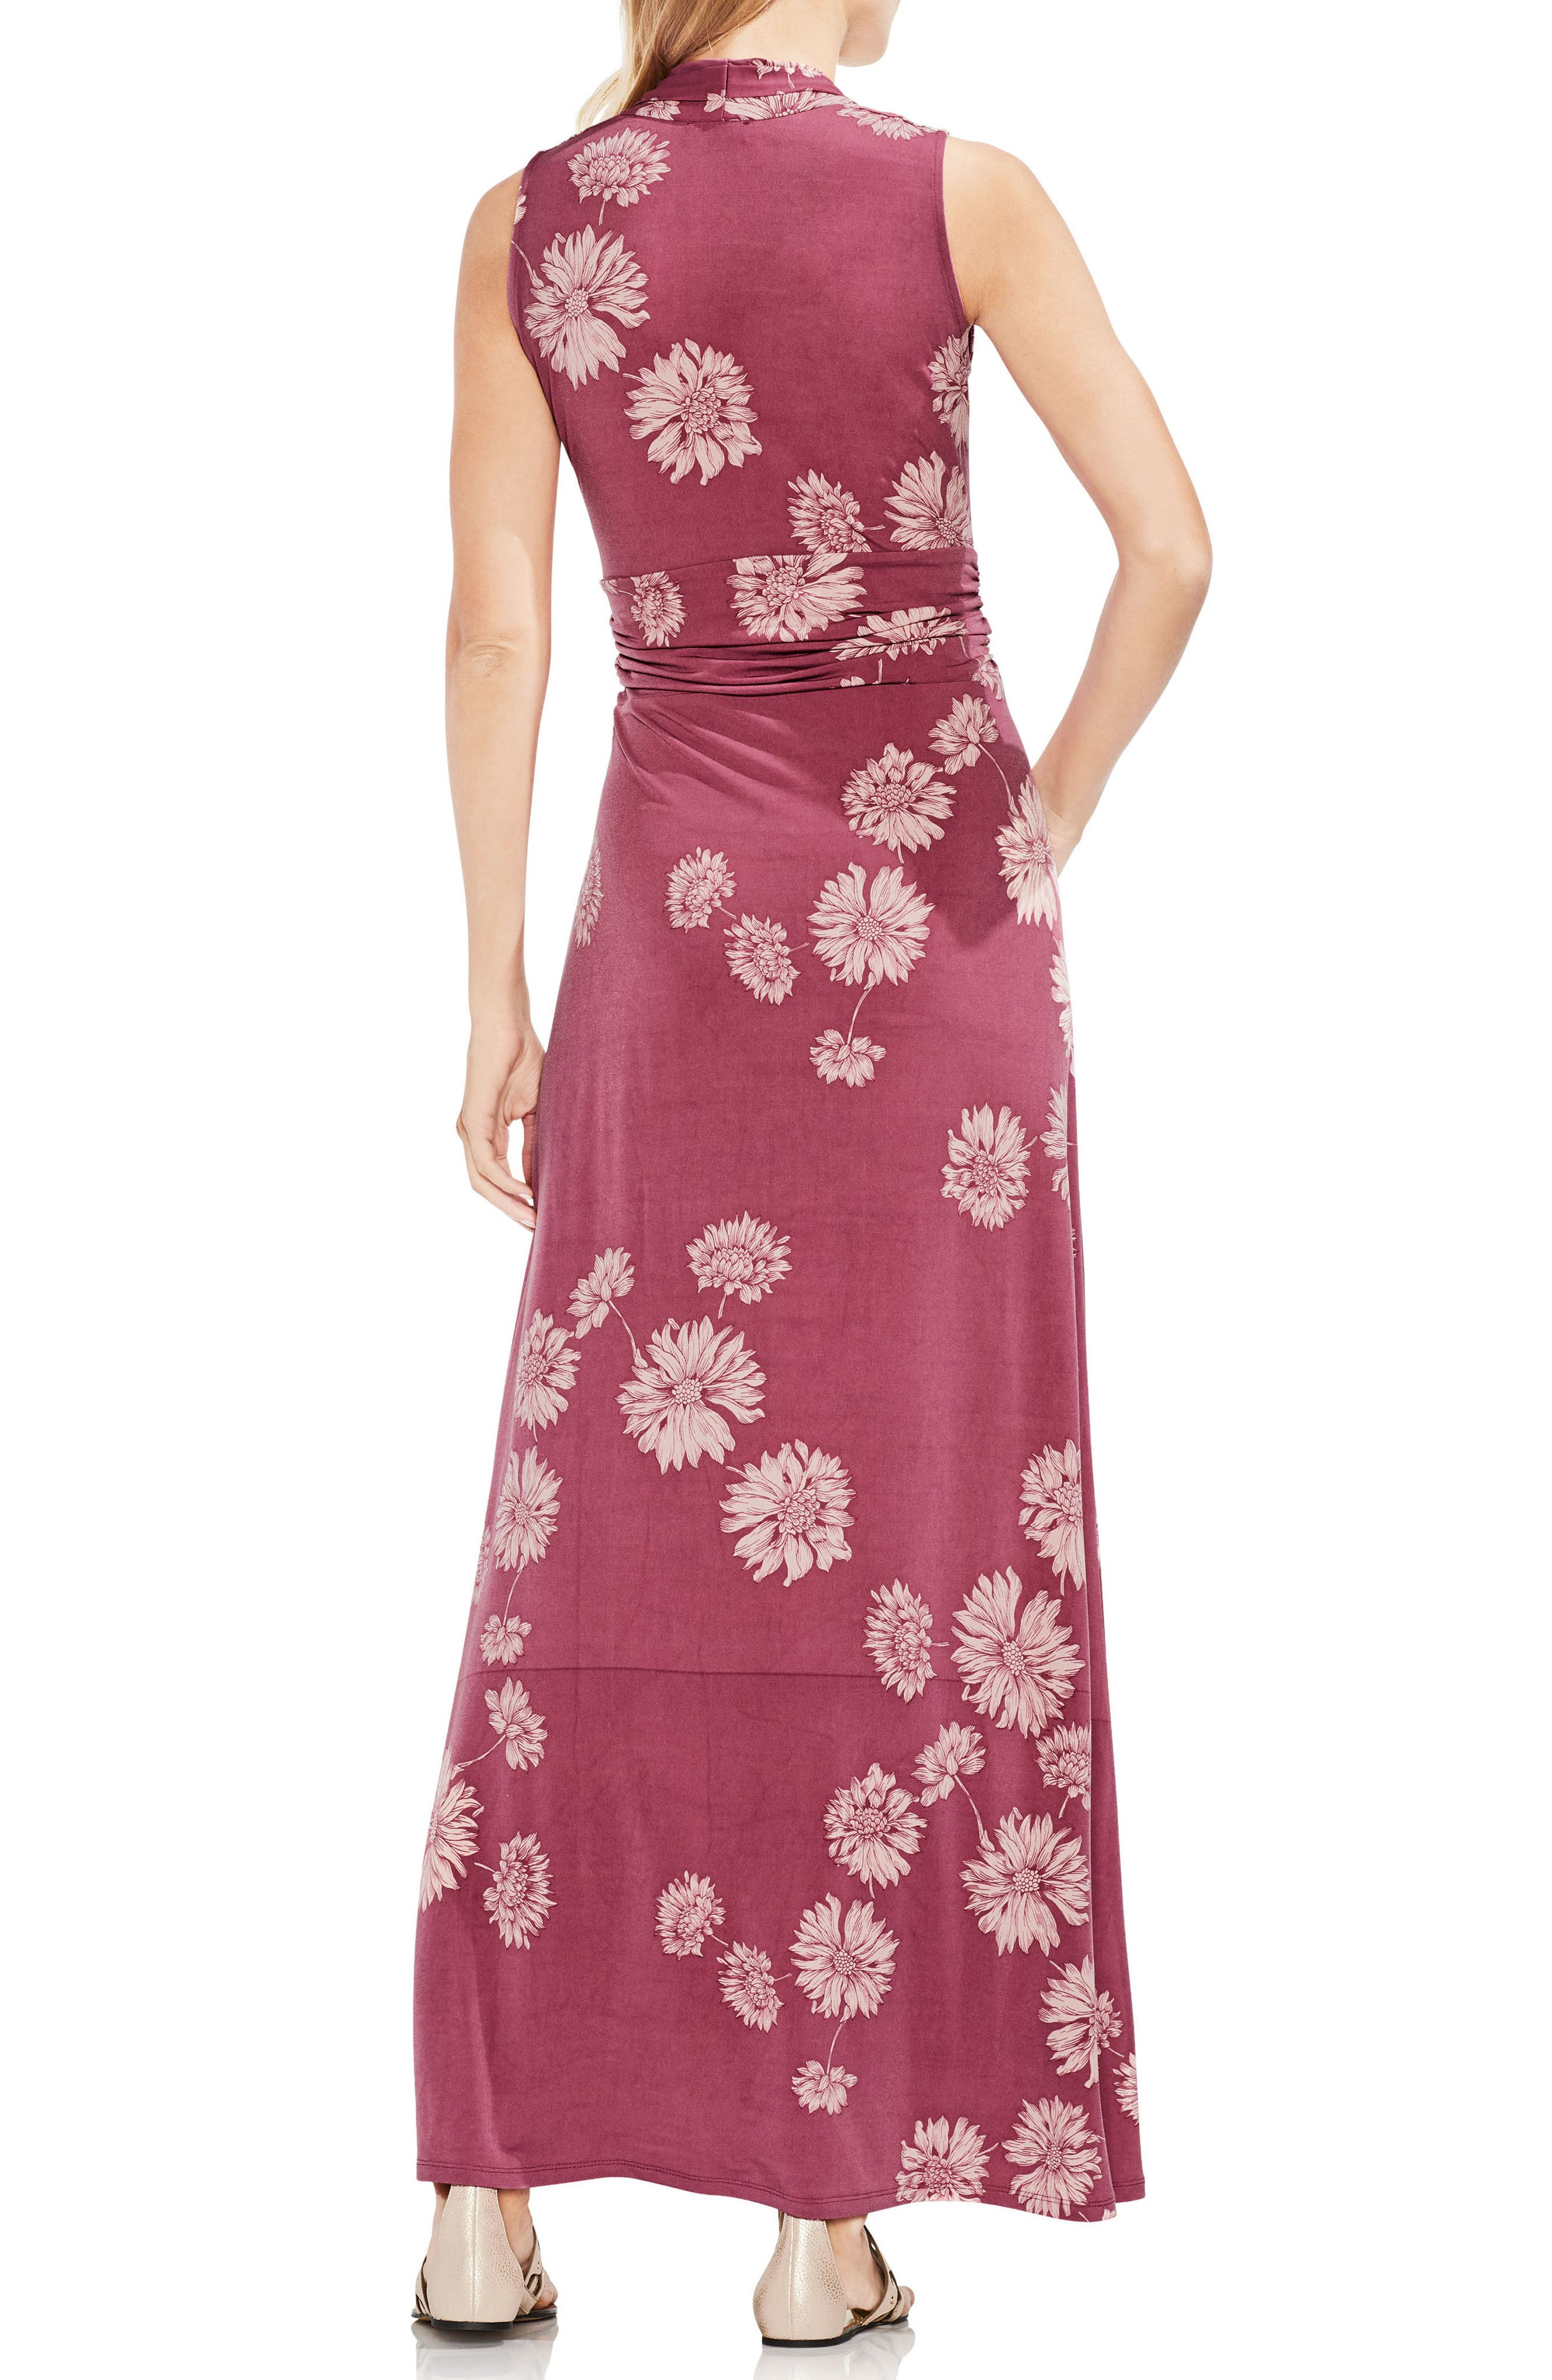 Chateau Floral Halter Maxi Dress,                             Alternate thumbnail 4, color,